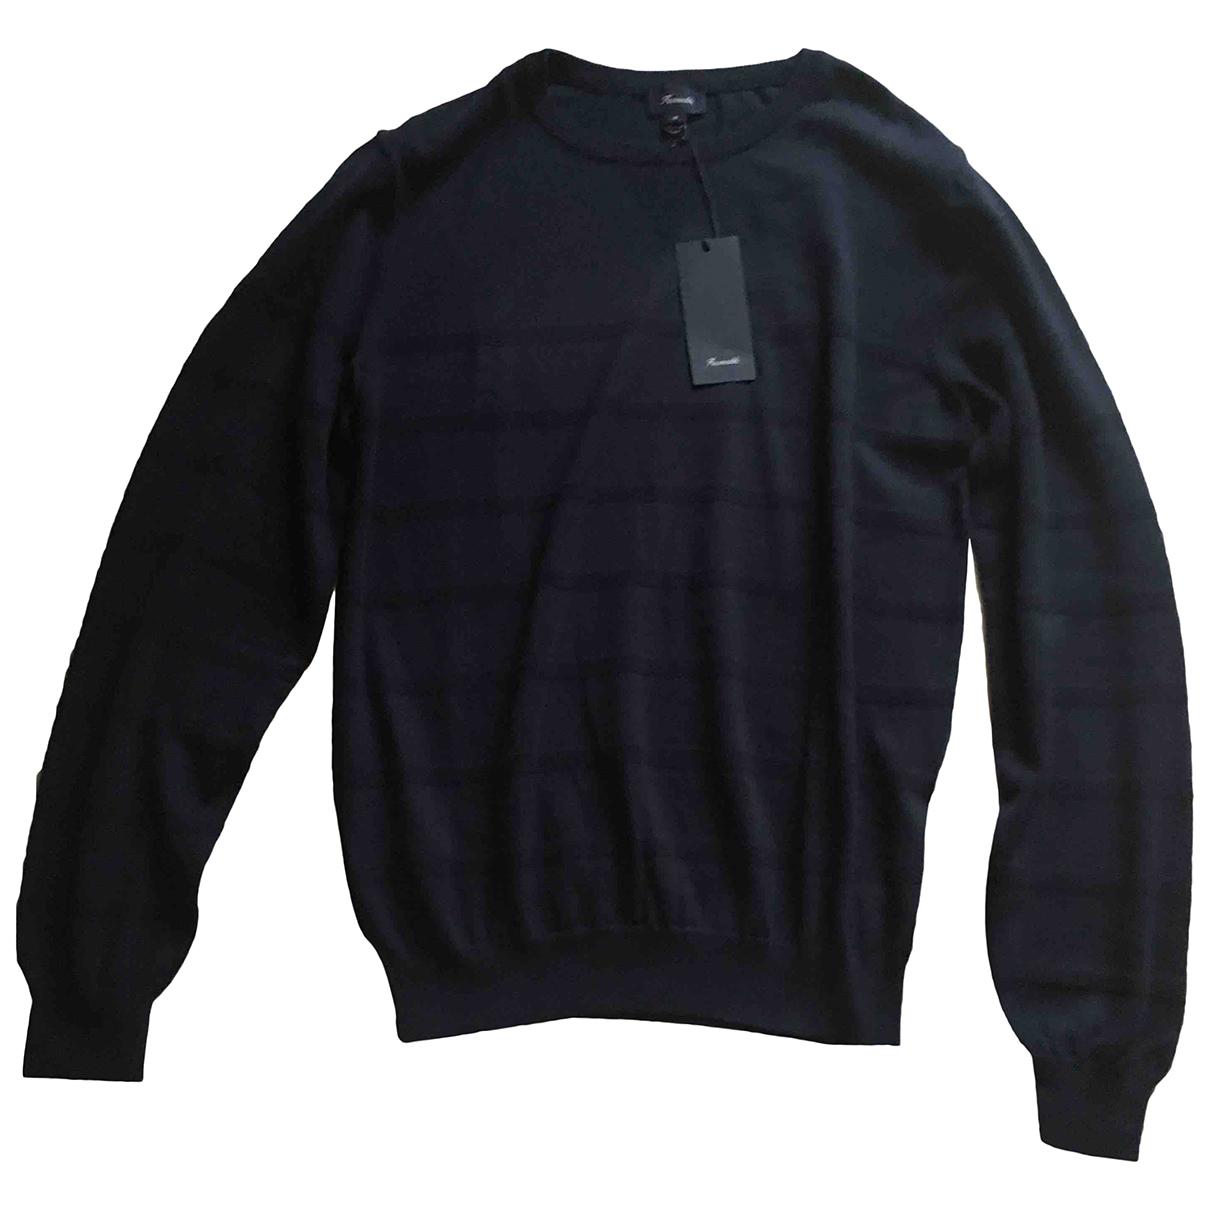 Faconnable N Navy Cotton Knitwear & Sweatshirts for Men M International